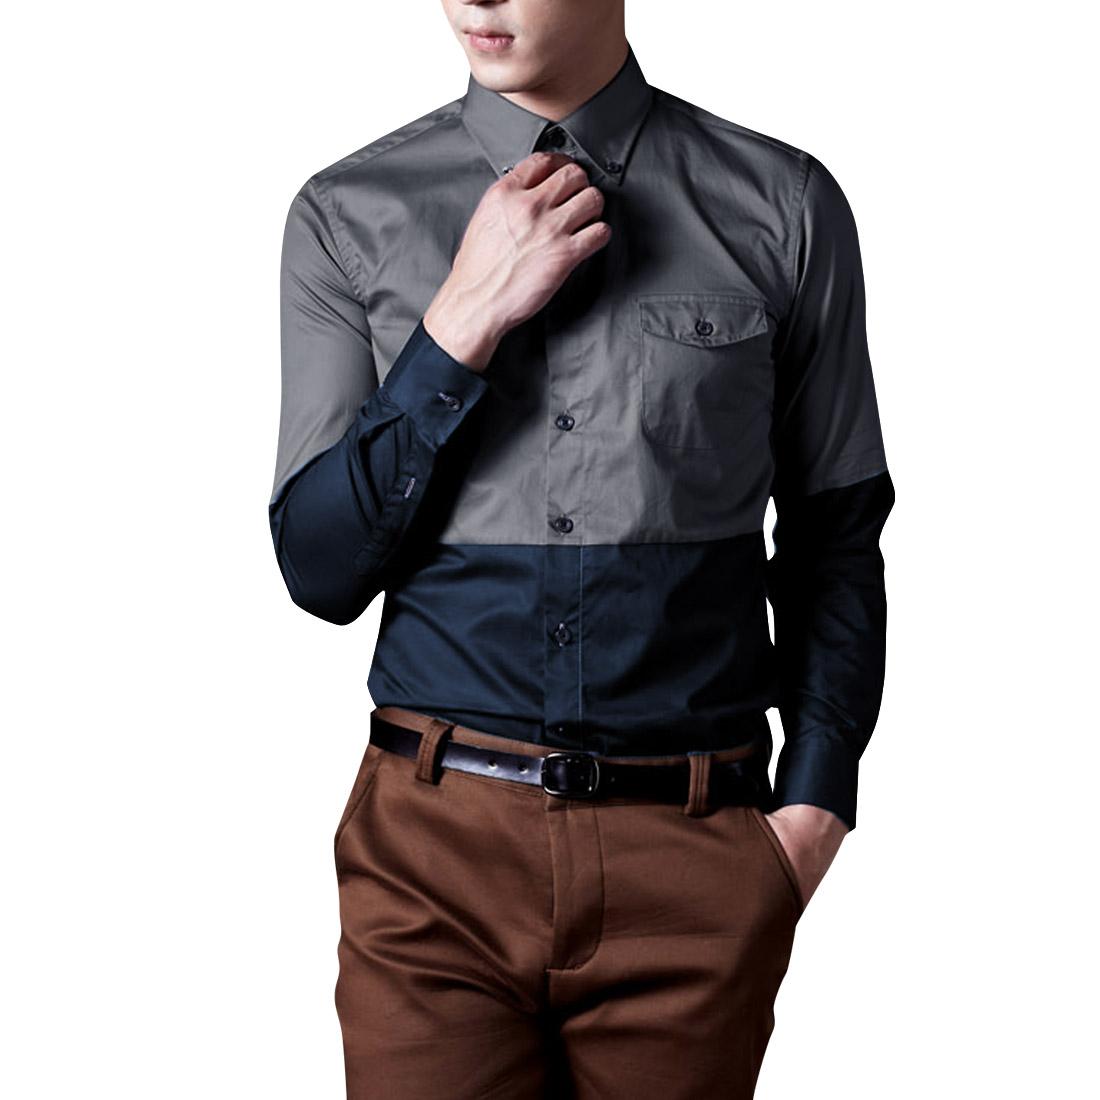 Men Point Collar Long Sleeved Dark Gray Navy Blue Top Shirt M